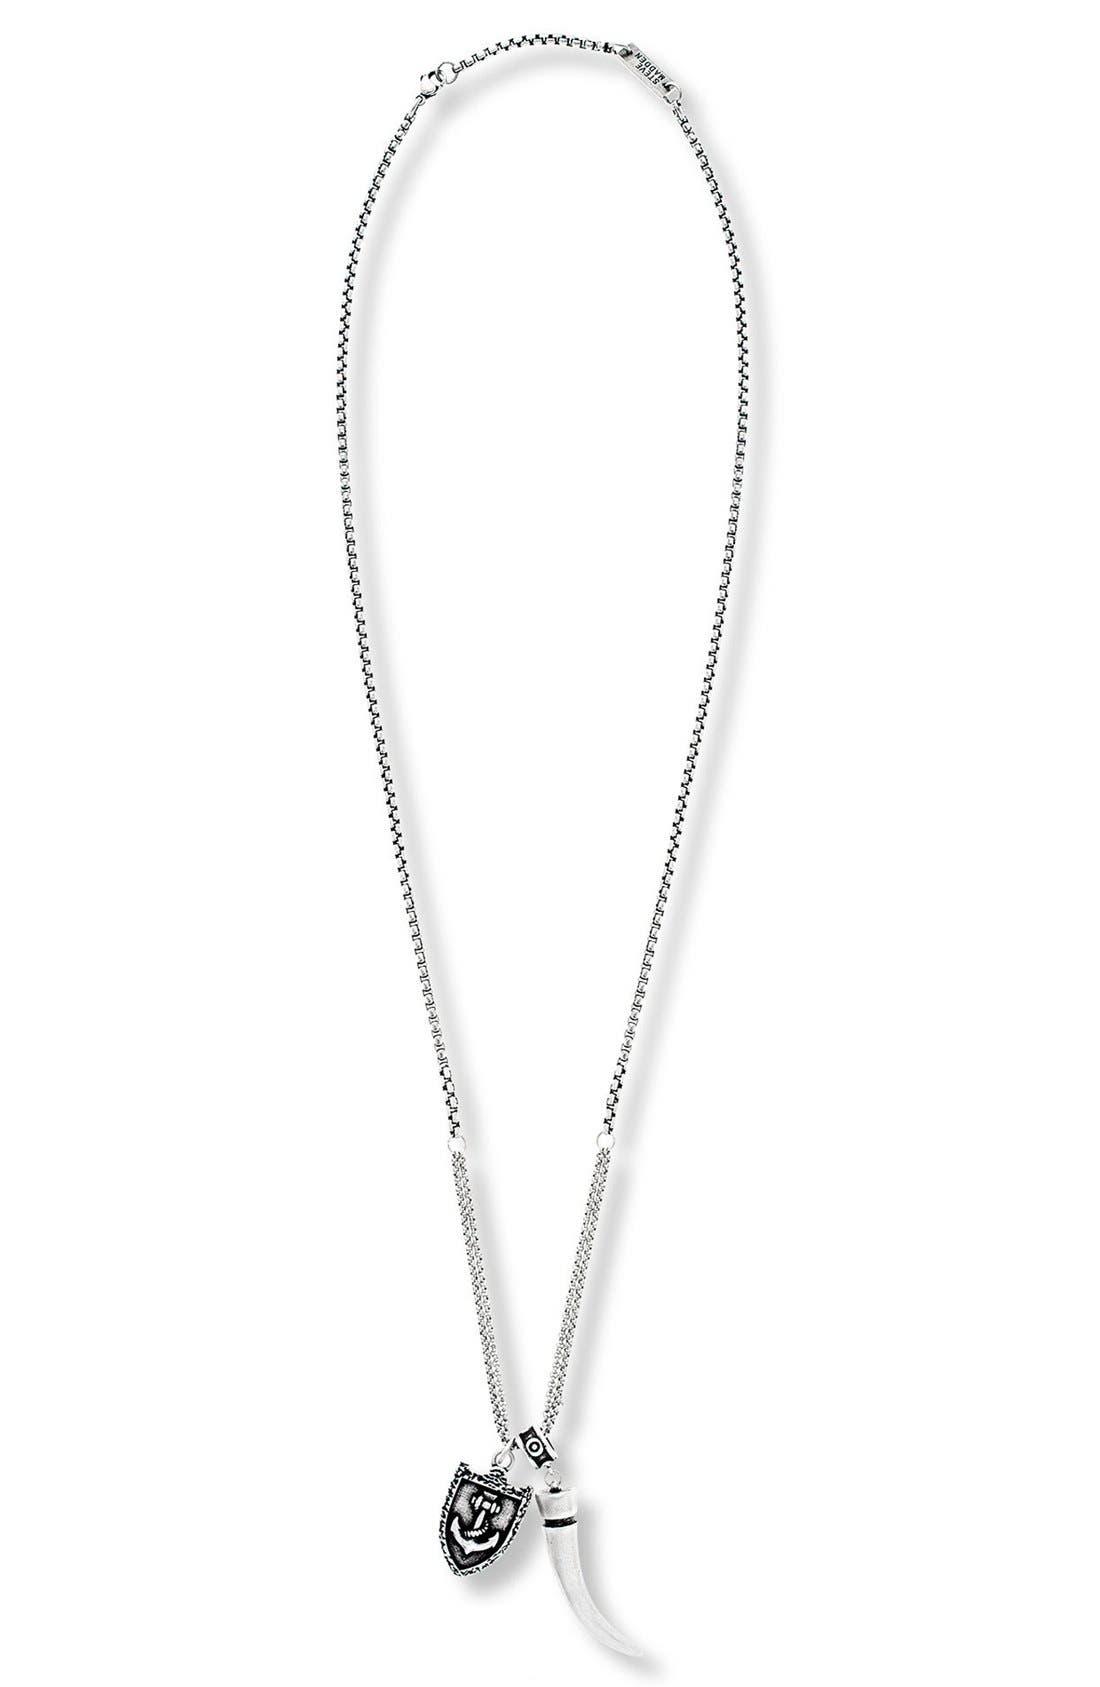 Horn & Armor Pendant Necklace,                             Main thumbnail 1, color,                             040